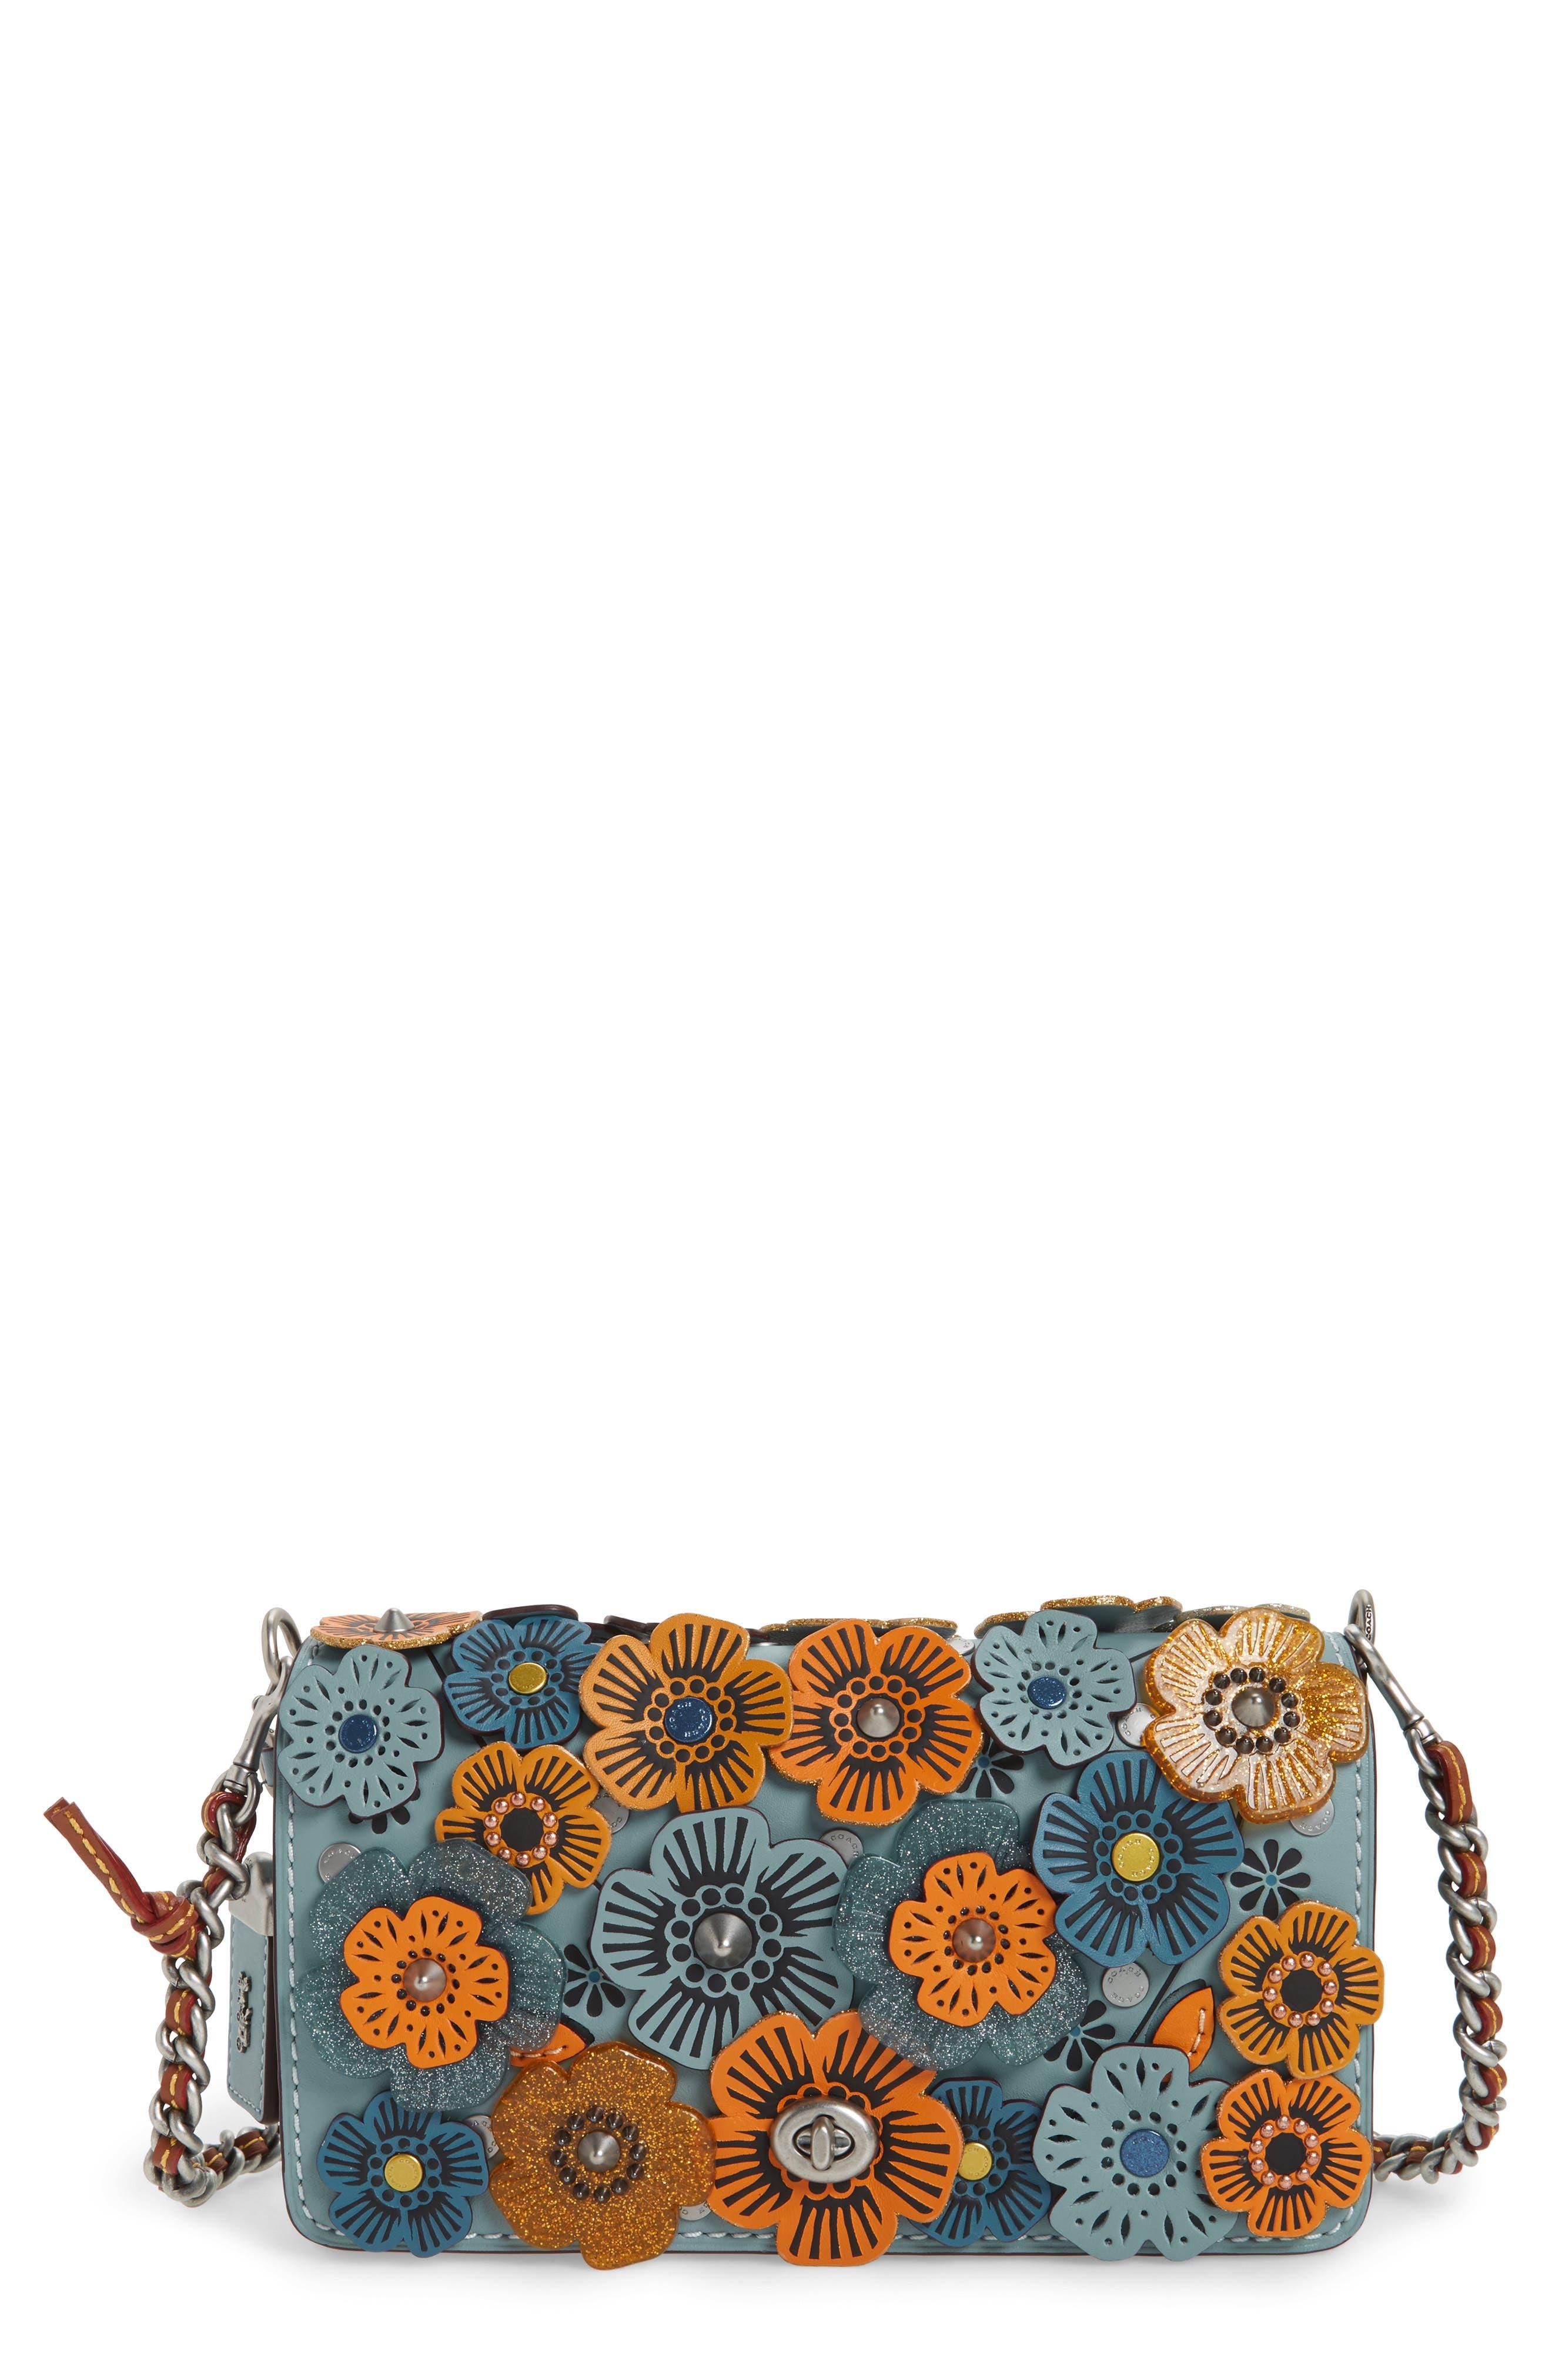 Dinky Tea Rose Appliqué Leather Crossbody Bag,                             Main thumbnail 1, color,                             Steel Blue